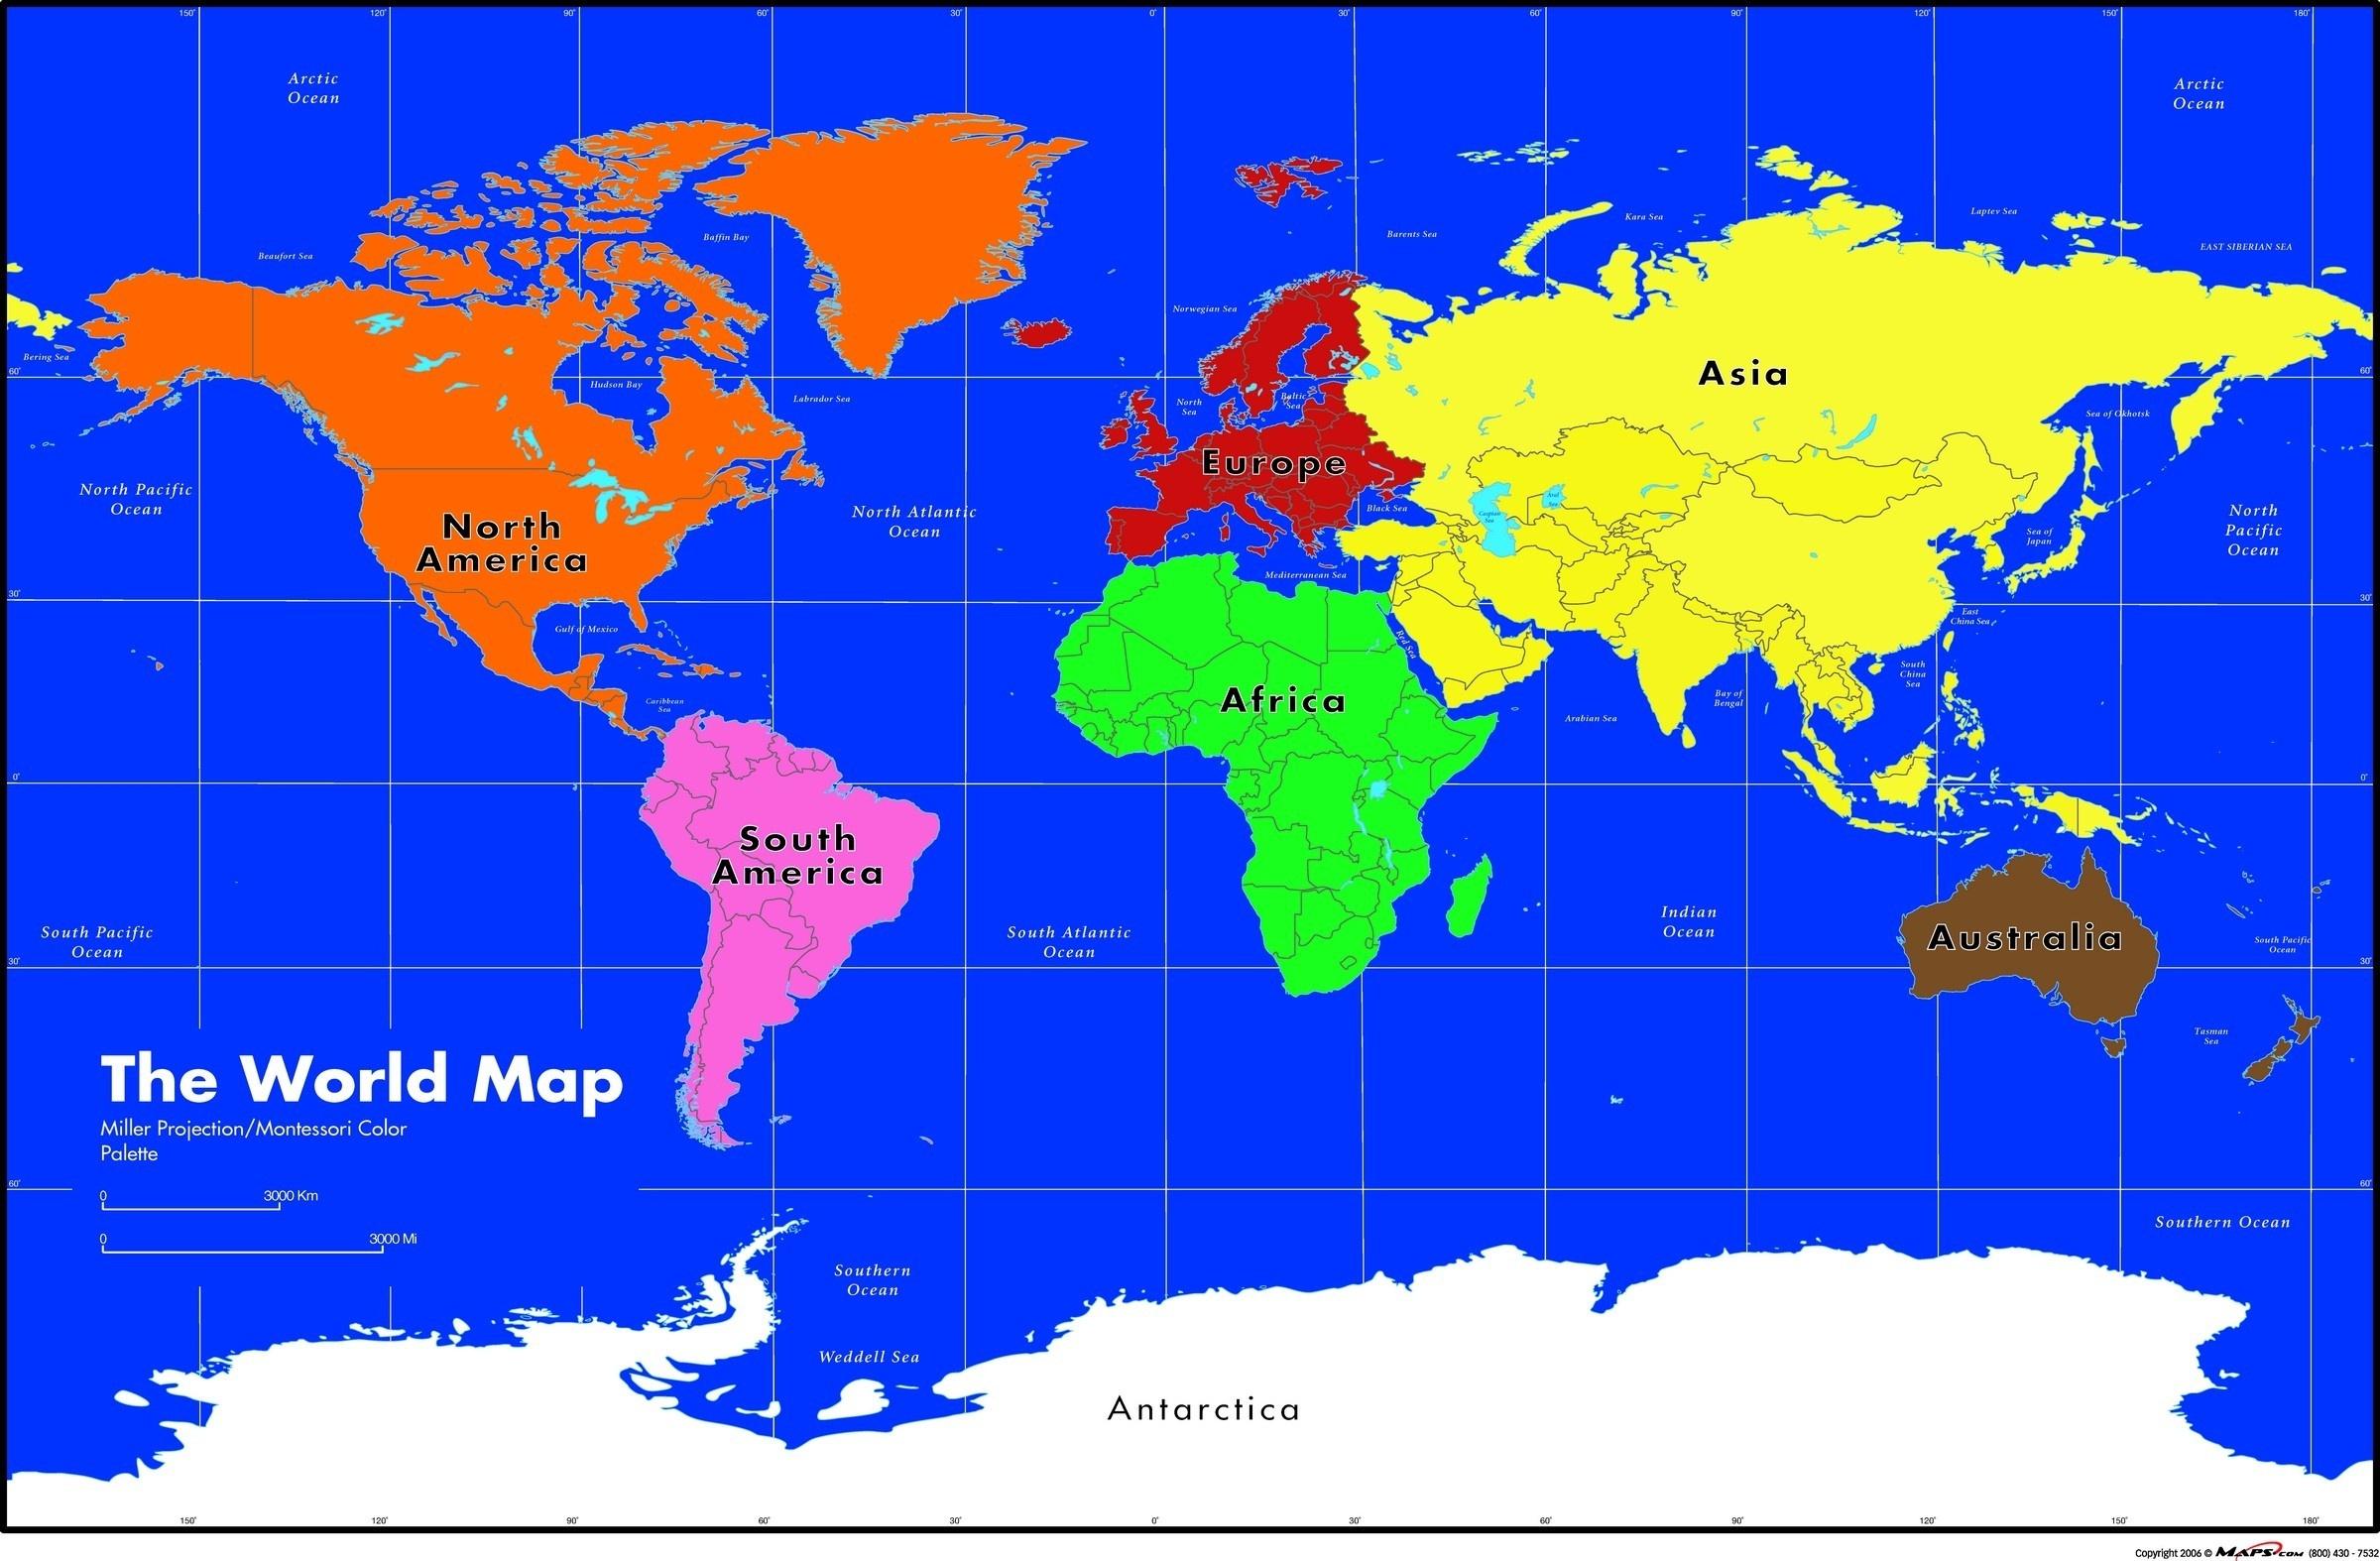 Maps Com Montessori World Wall Map Asia 1 - World Wide Maps - Montessori World Map Free Printable